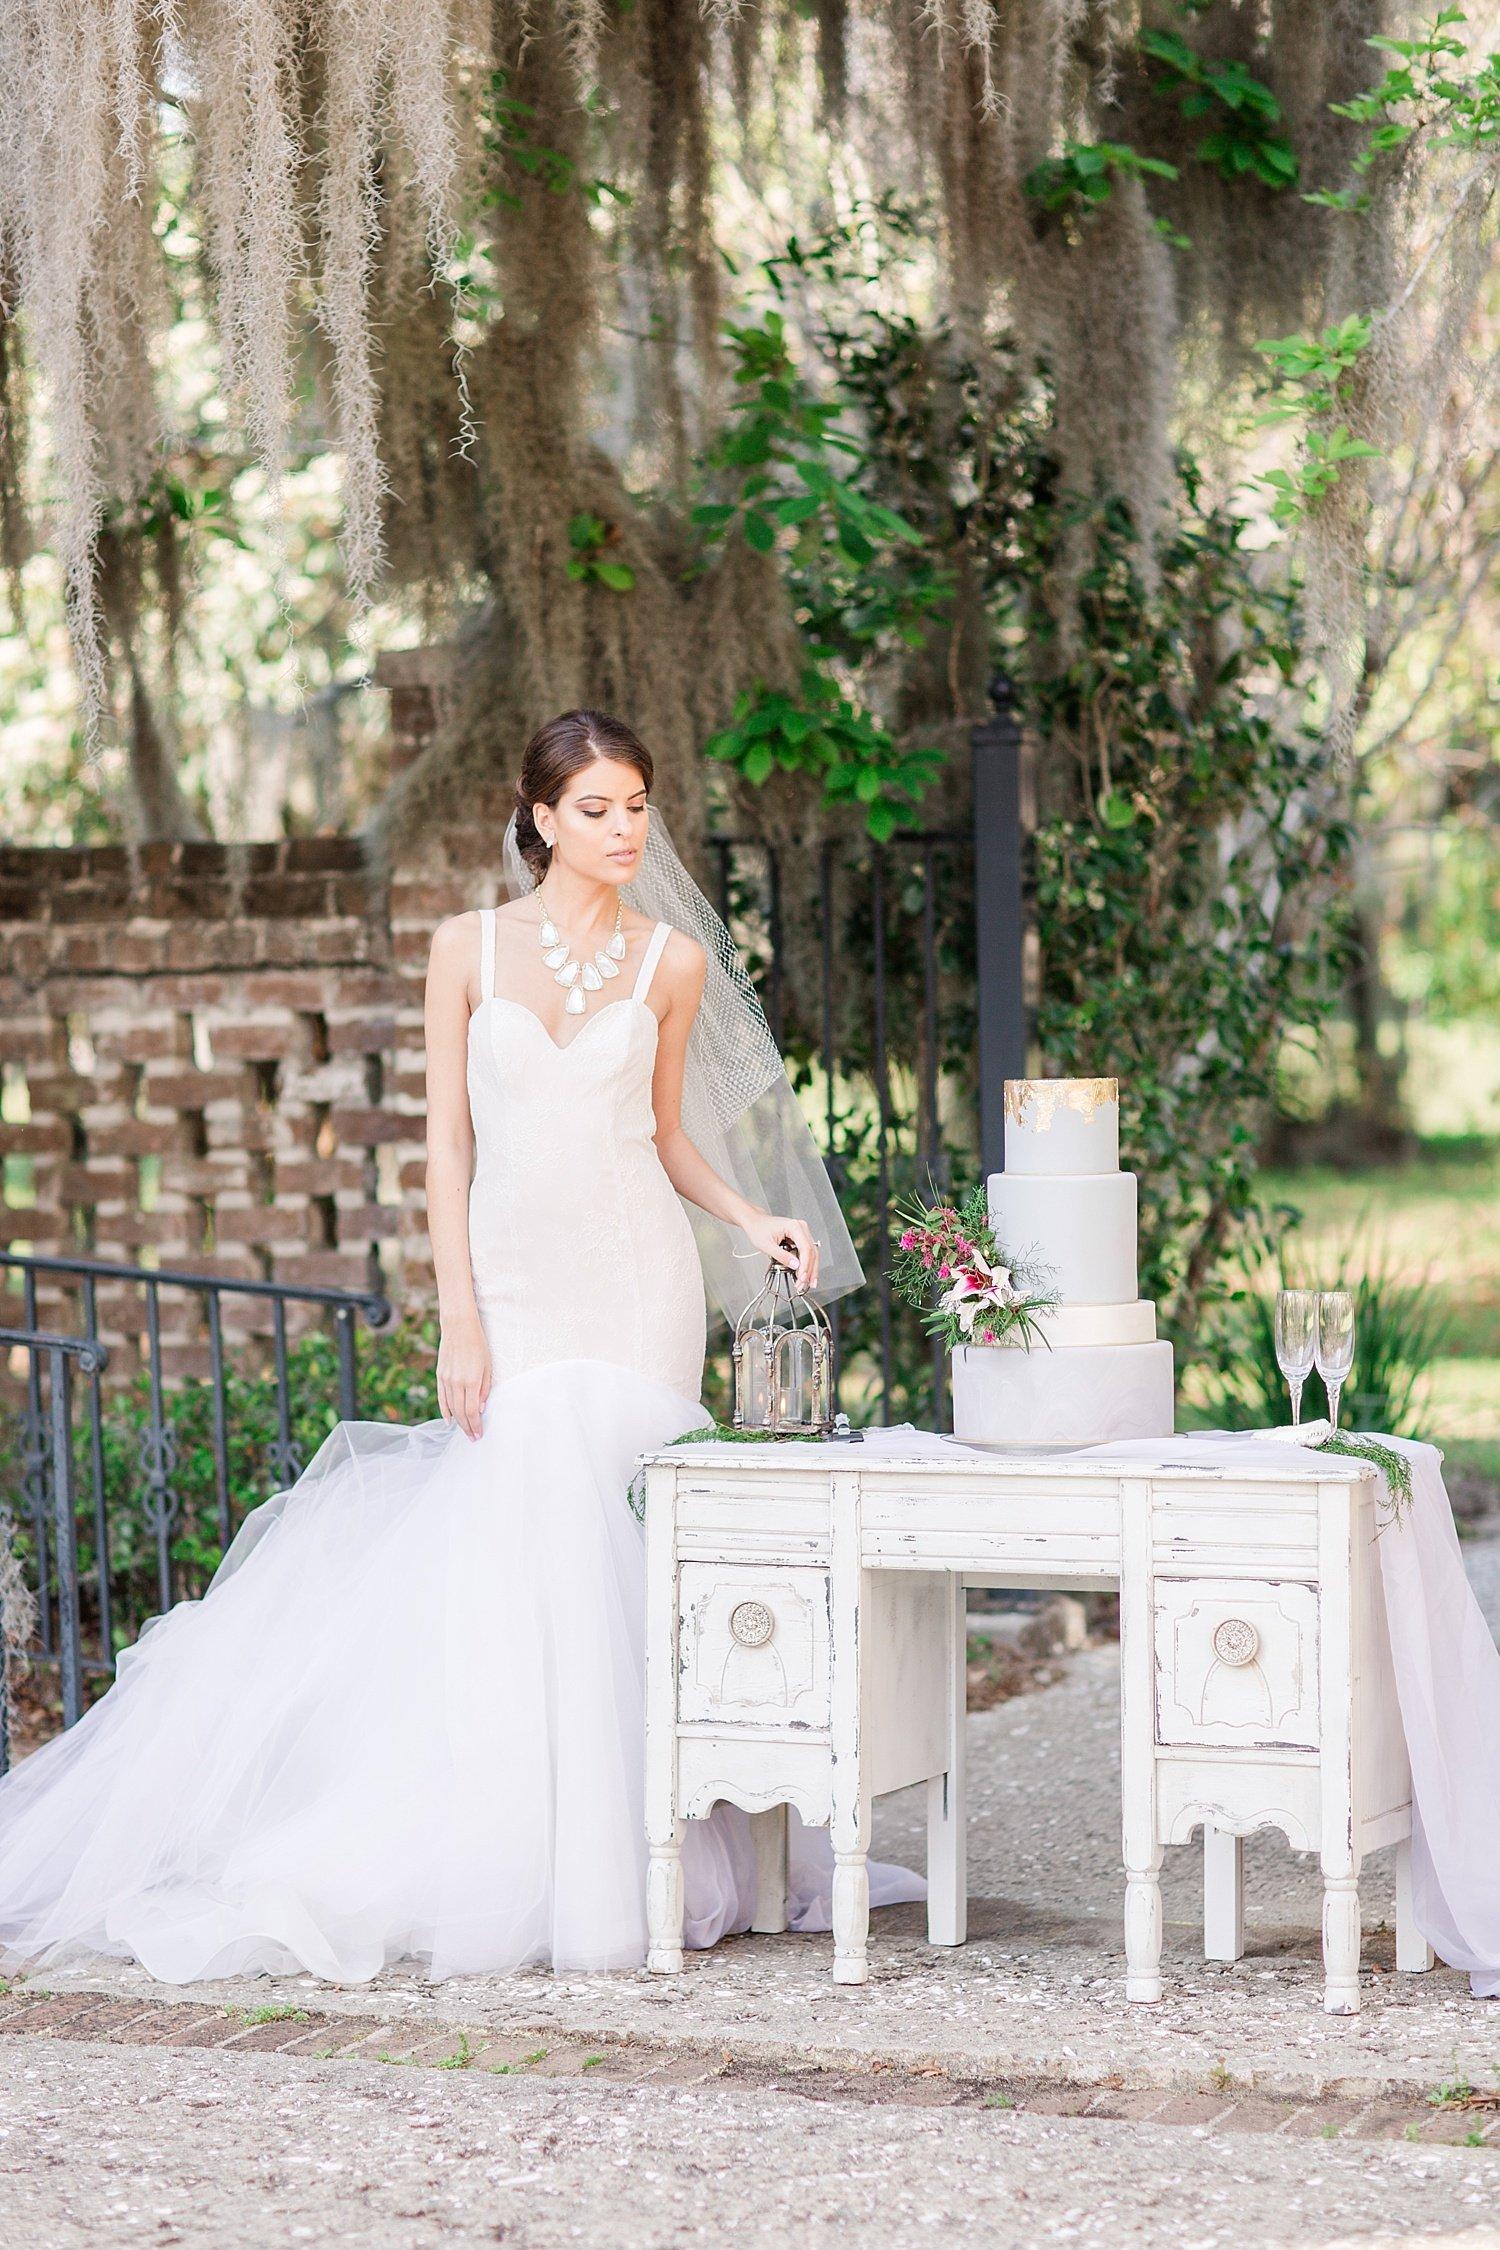 rachel-strickland-photography-katie-may-ivory-and-beau-bridal-boutique-bethesda-academy-wedding-whitfield-chapel-wedding-savannah-bridal-boutique-savannah-weddings-savannah-wedding-savannah-wedding-planner-savannah-bridal-gowns-savannah-bride-21.jpg